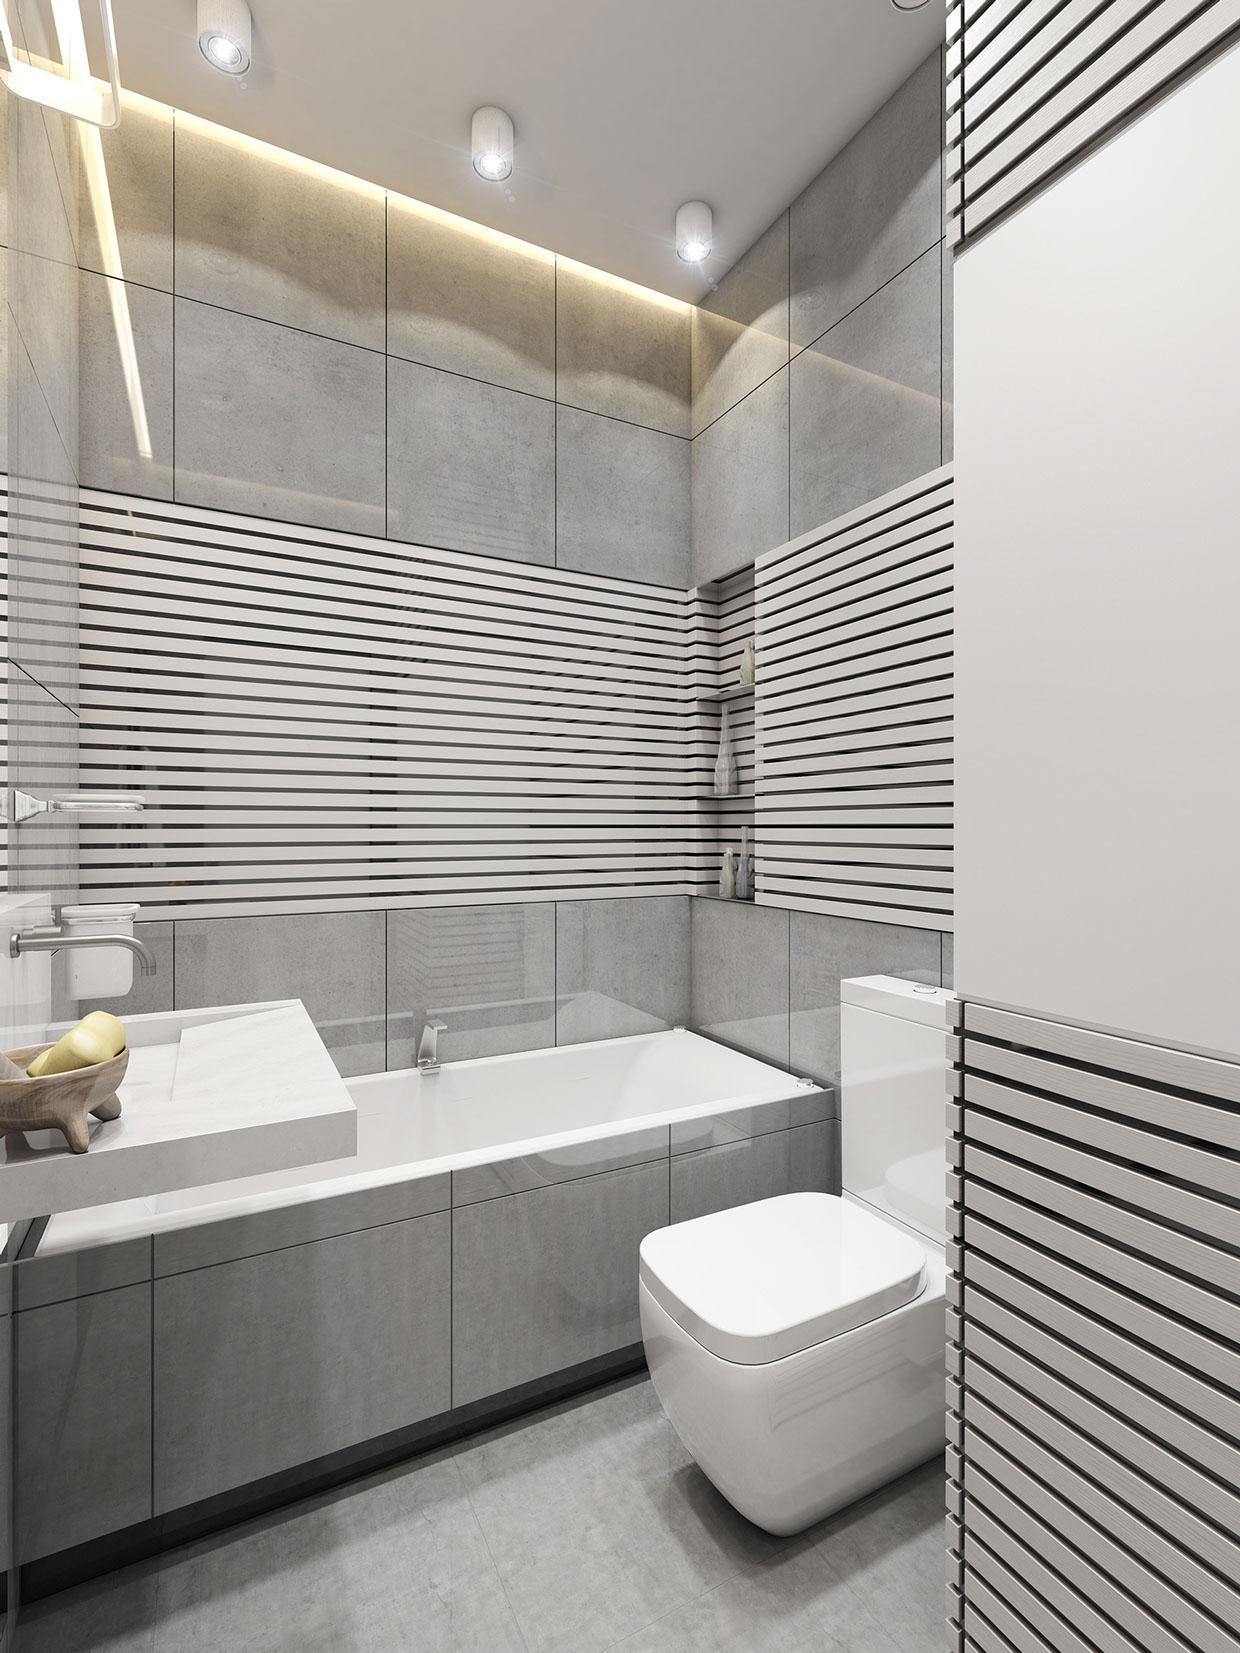 A Suitable Simple Small Bathroom Designs Looks So Perfect ... on Bathroom Ideas Modern Small  id=27345